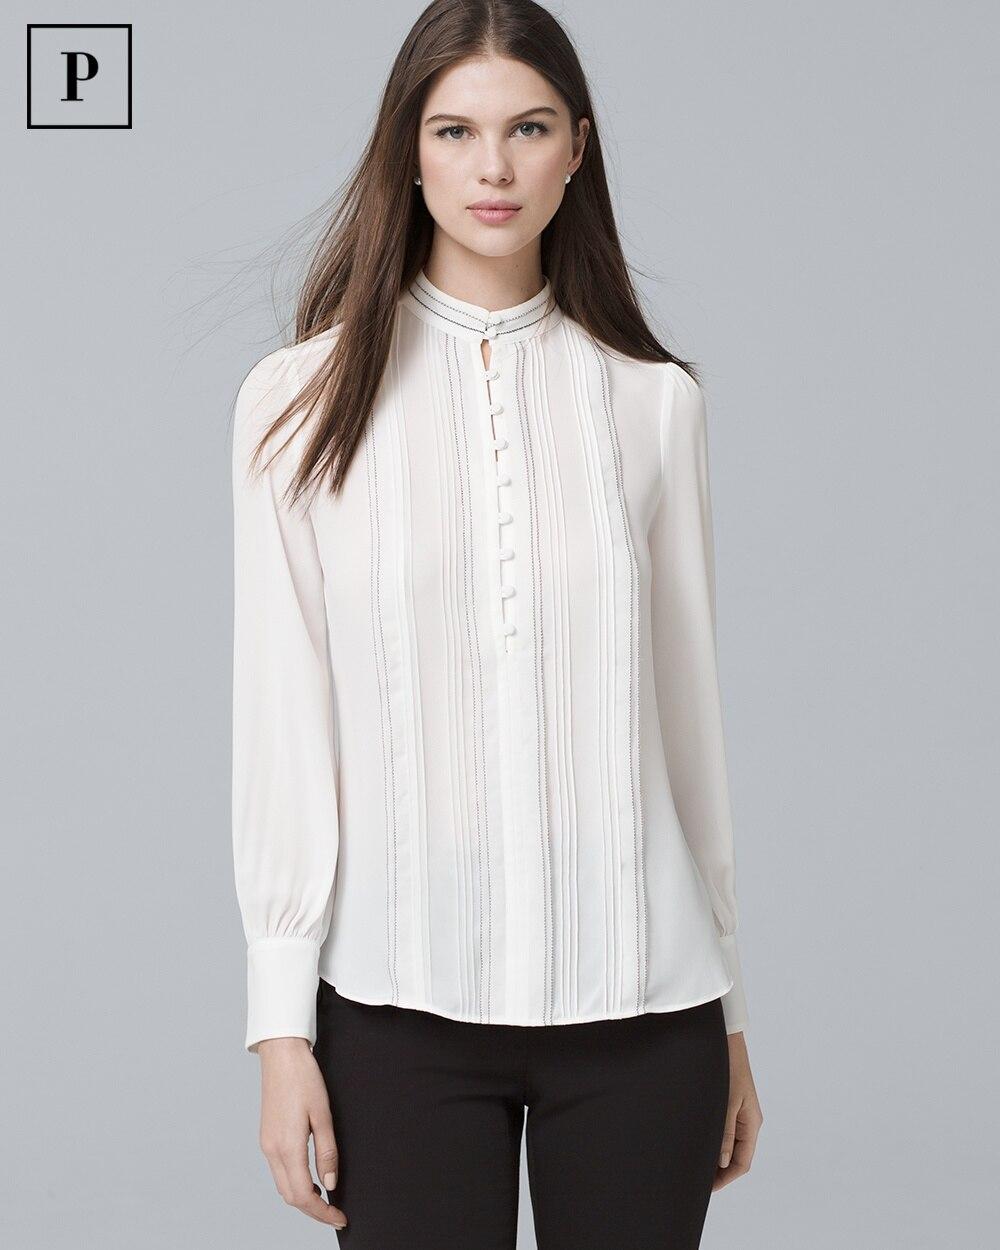 c584418516549d Petite Pintucked Button-Front Blouse - White House Black Market